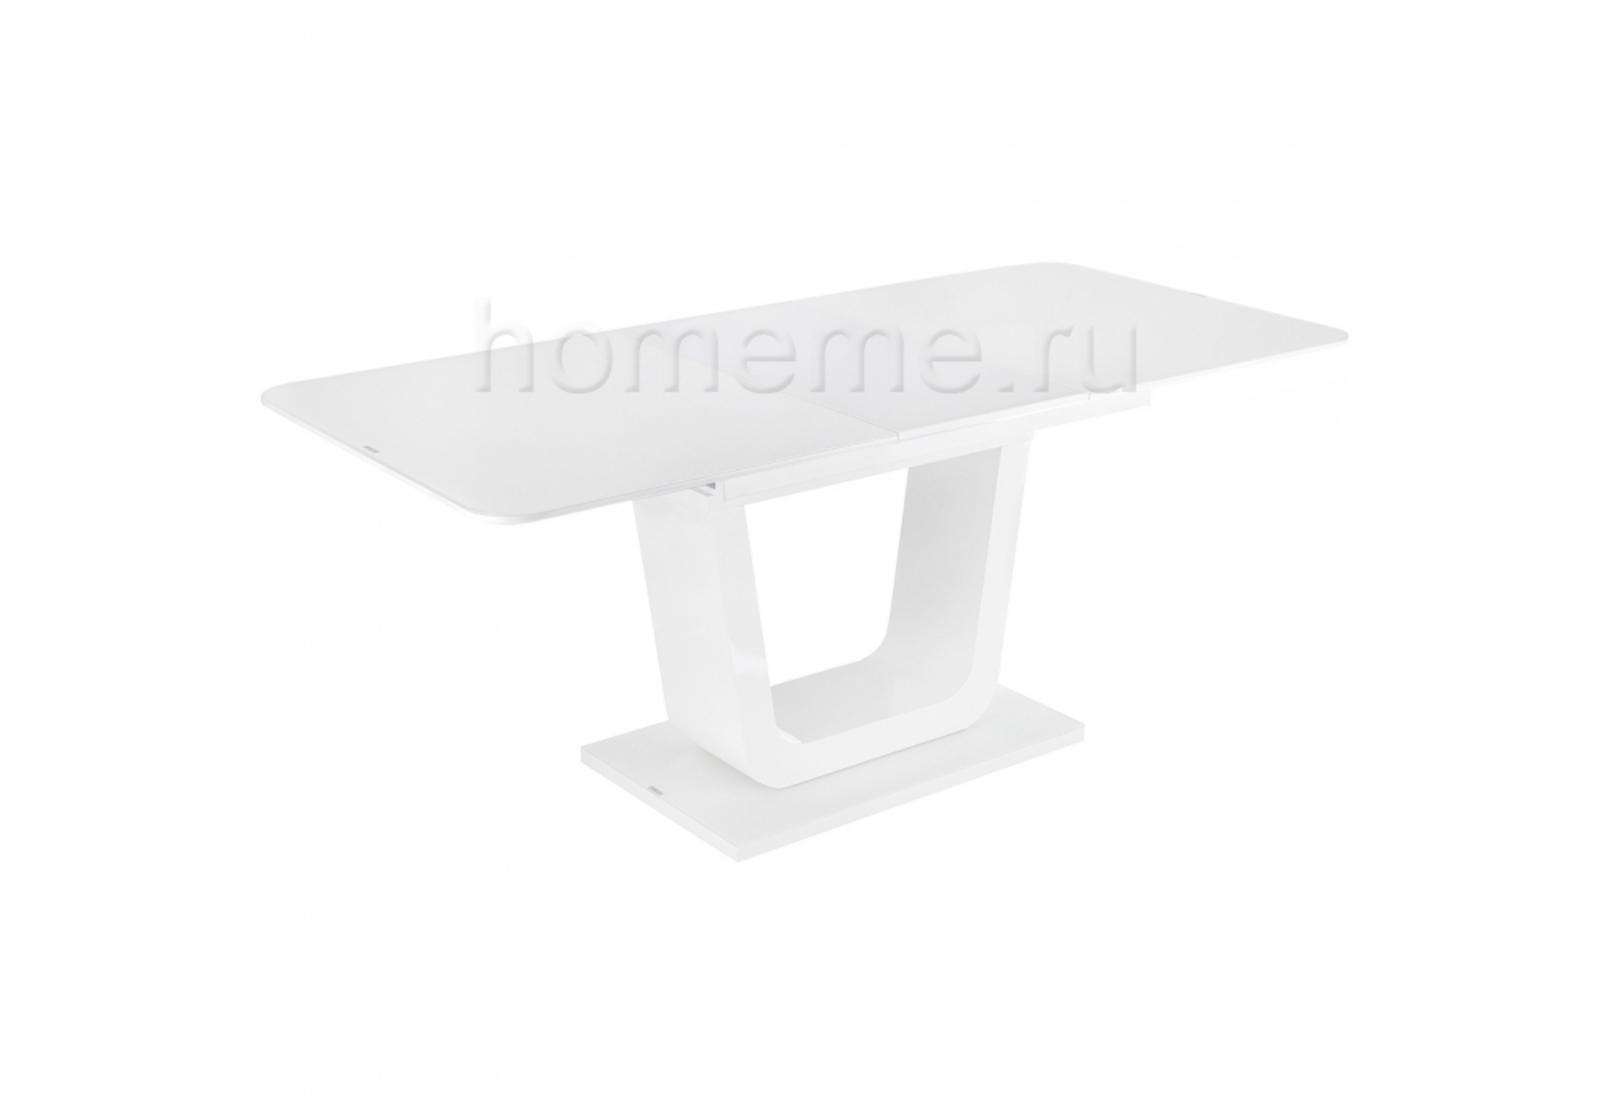 Стол стеклянный Vlinder 160 super white 11186 Vlinder 160 super white 11186 (14417)